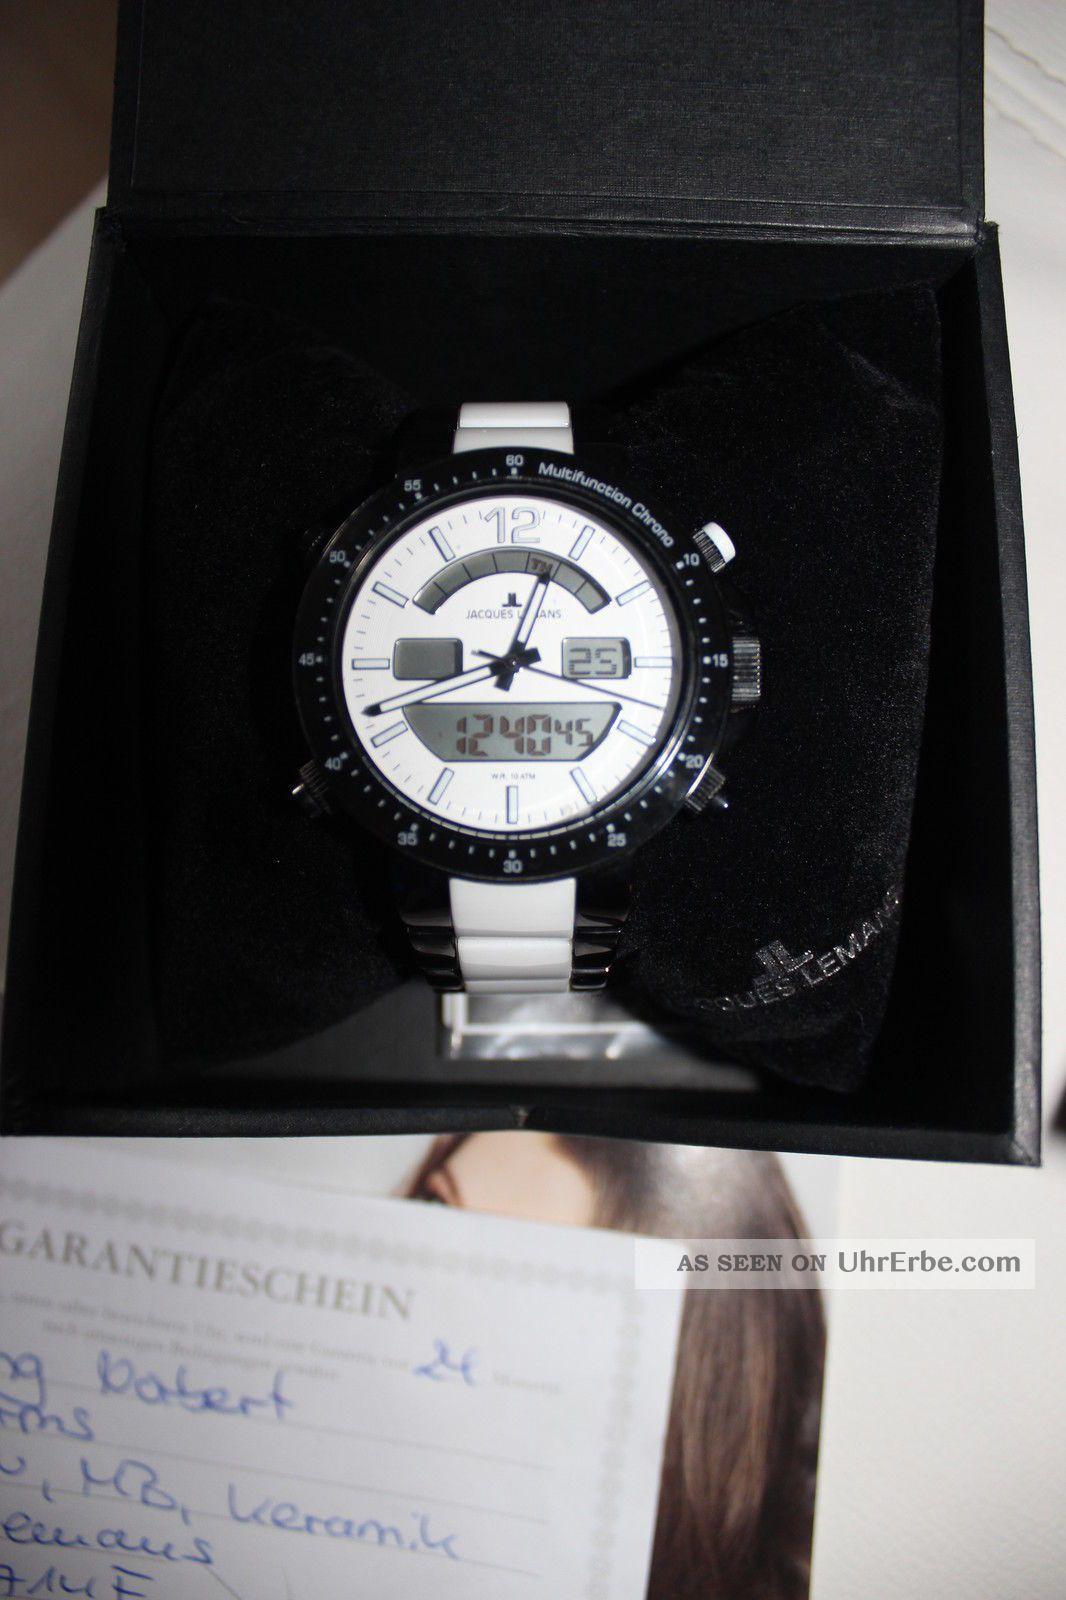 Jacques Lemans Uhr Sports Milano Sport Ceramic Chronograph 100m Top Armbanduhren Bild